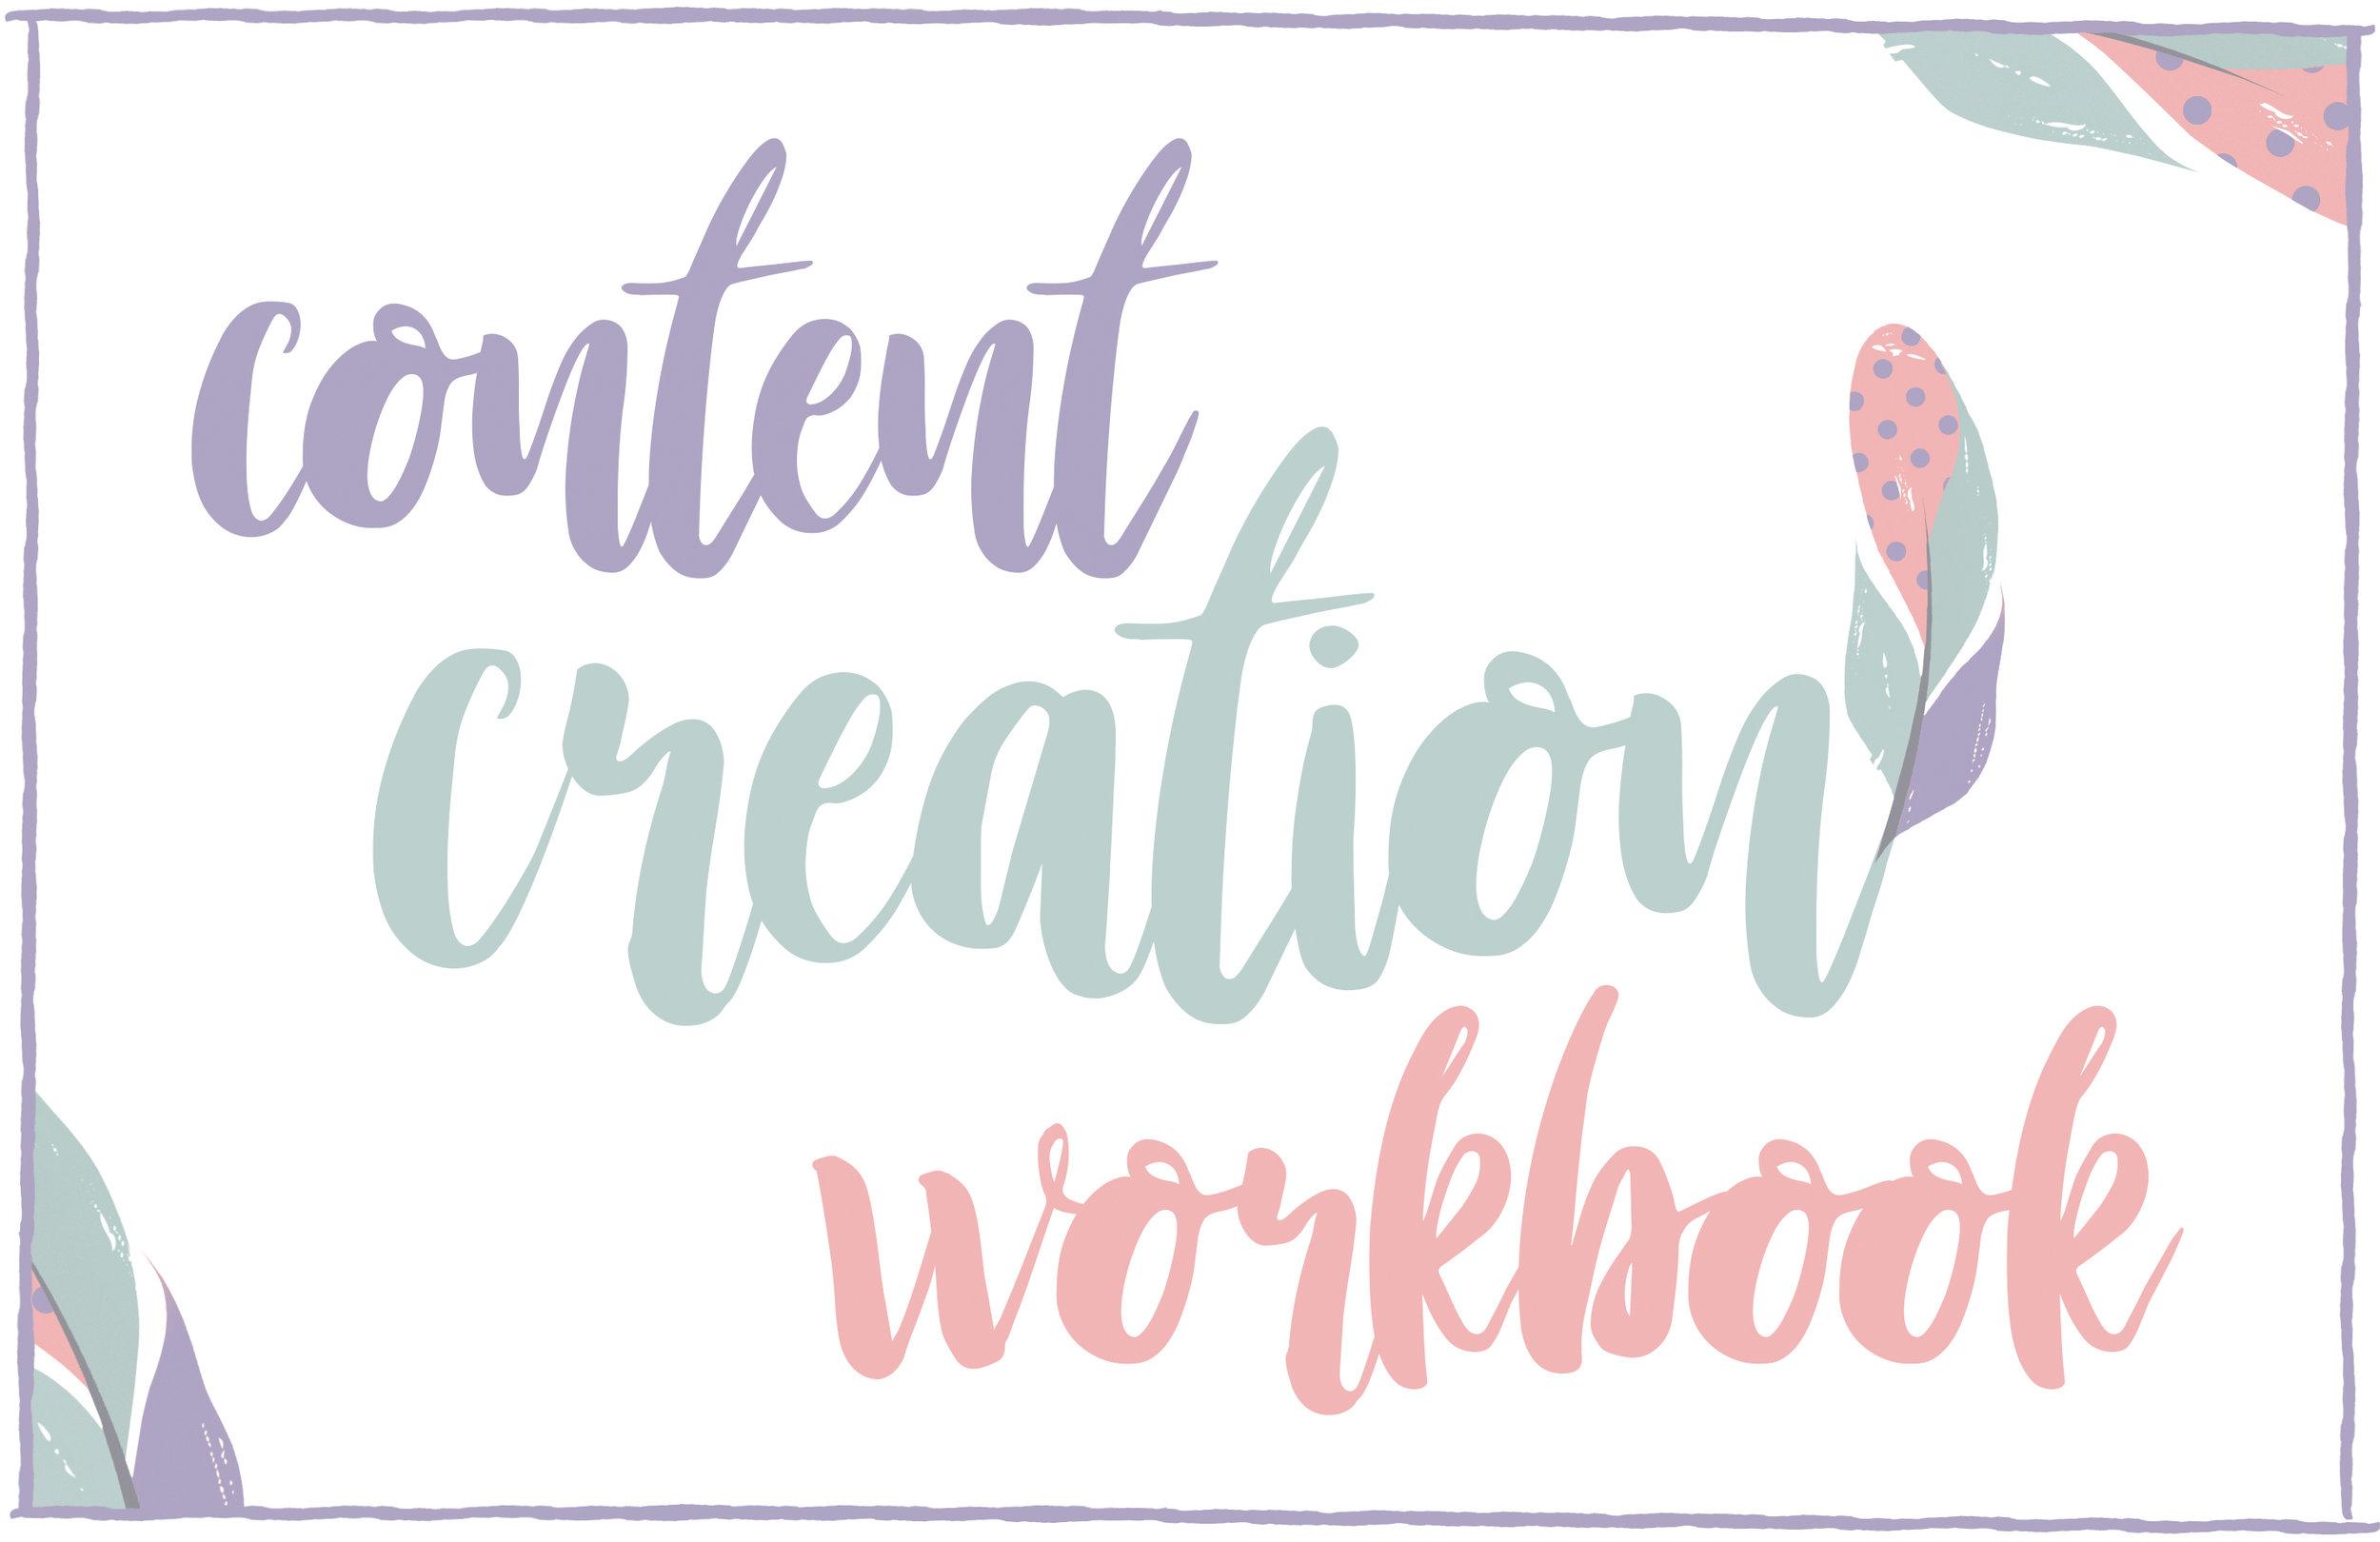 Content Creation Workbook Sales Page Image.jpg